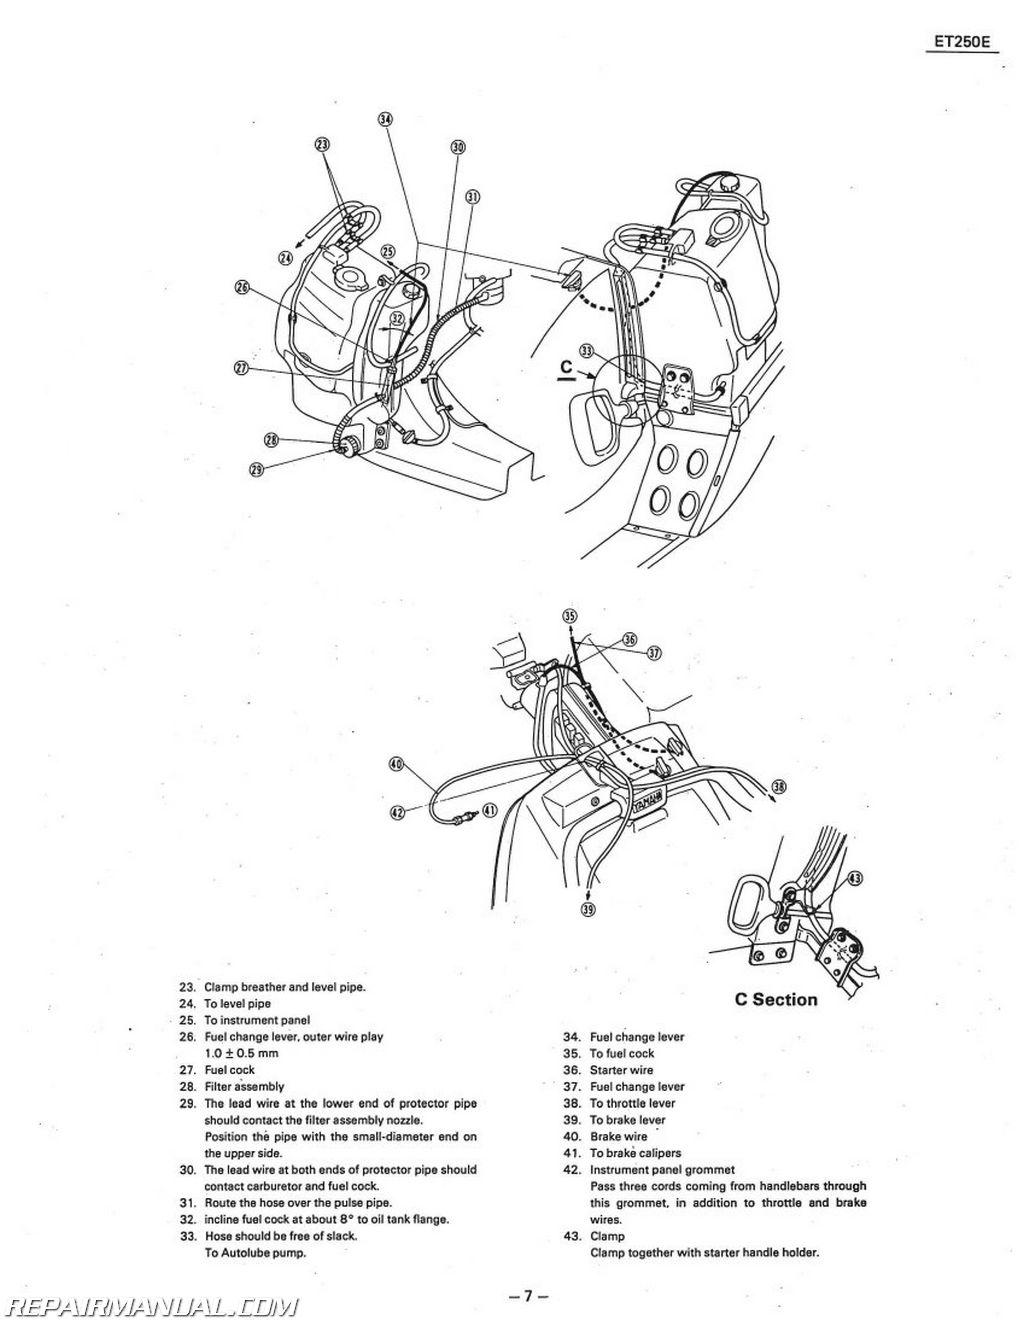 Yamaha Enticer 340 Wiring Diagram